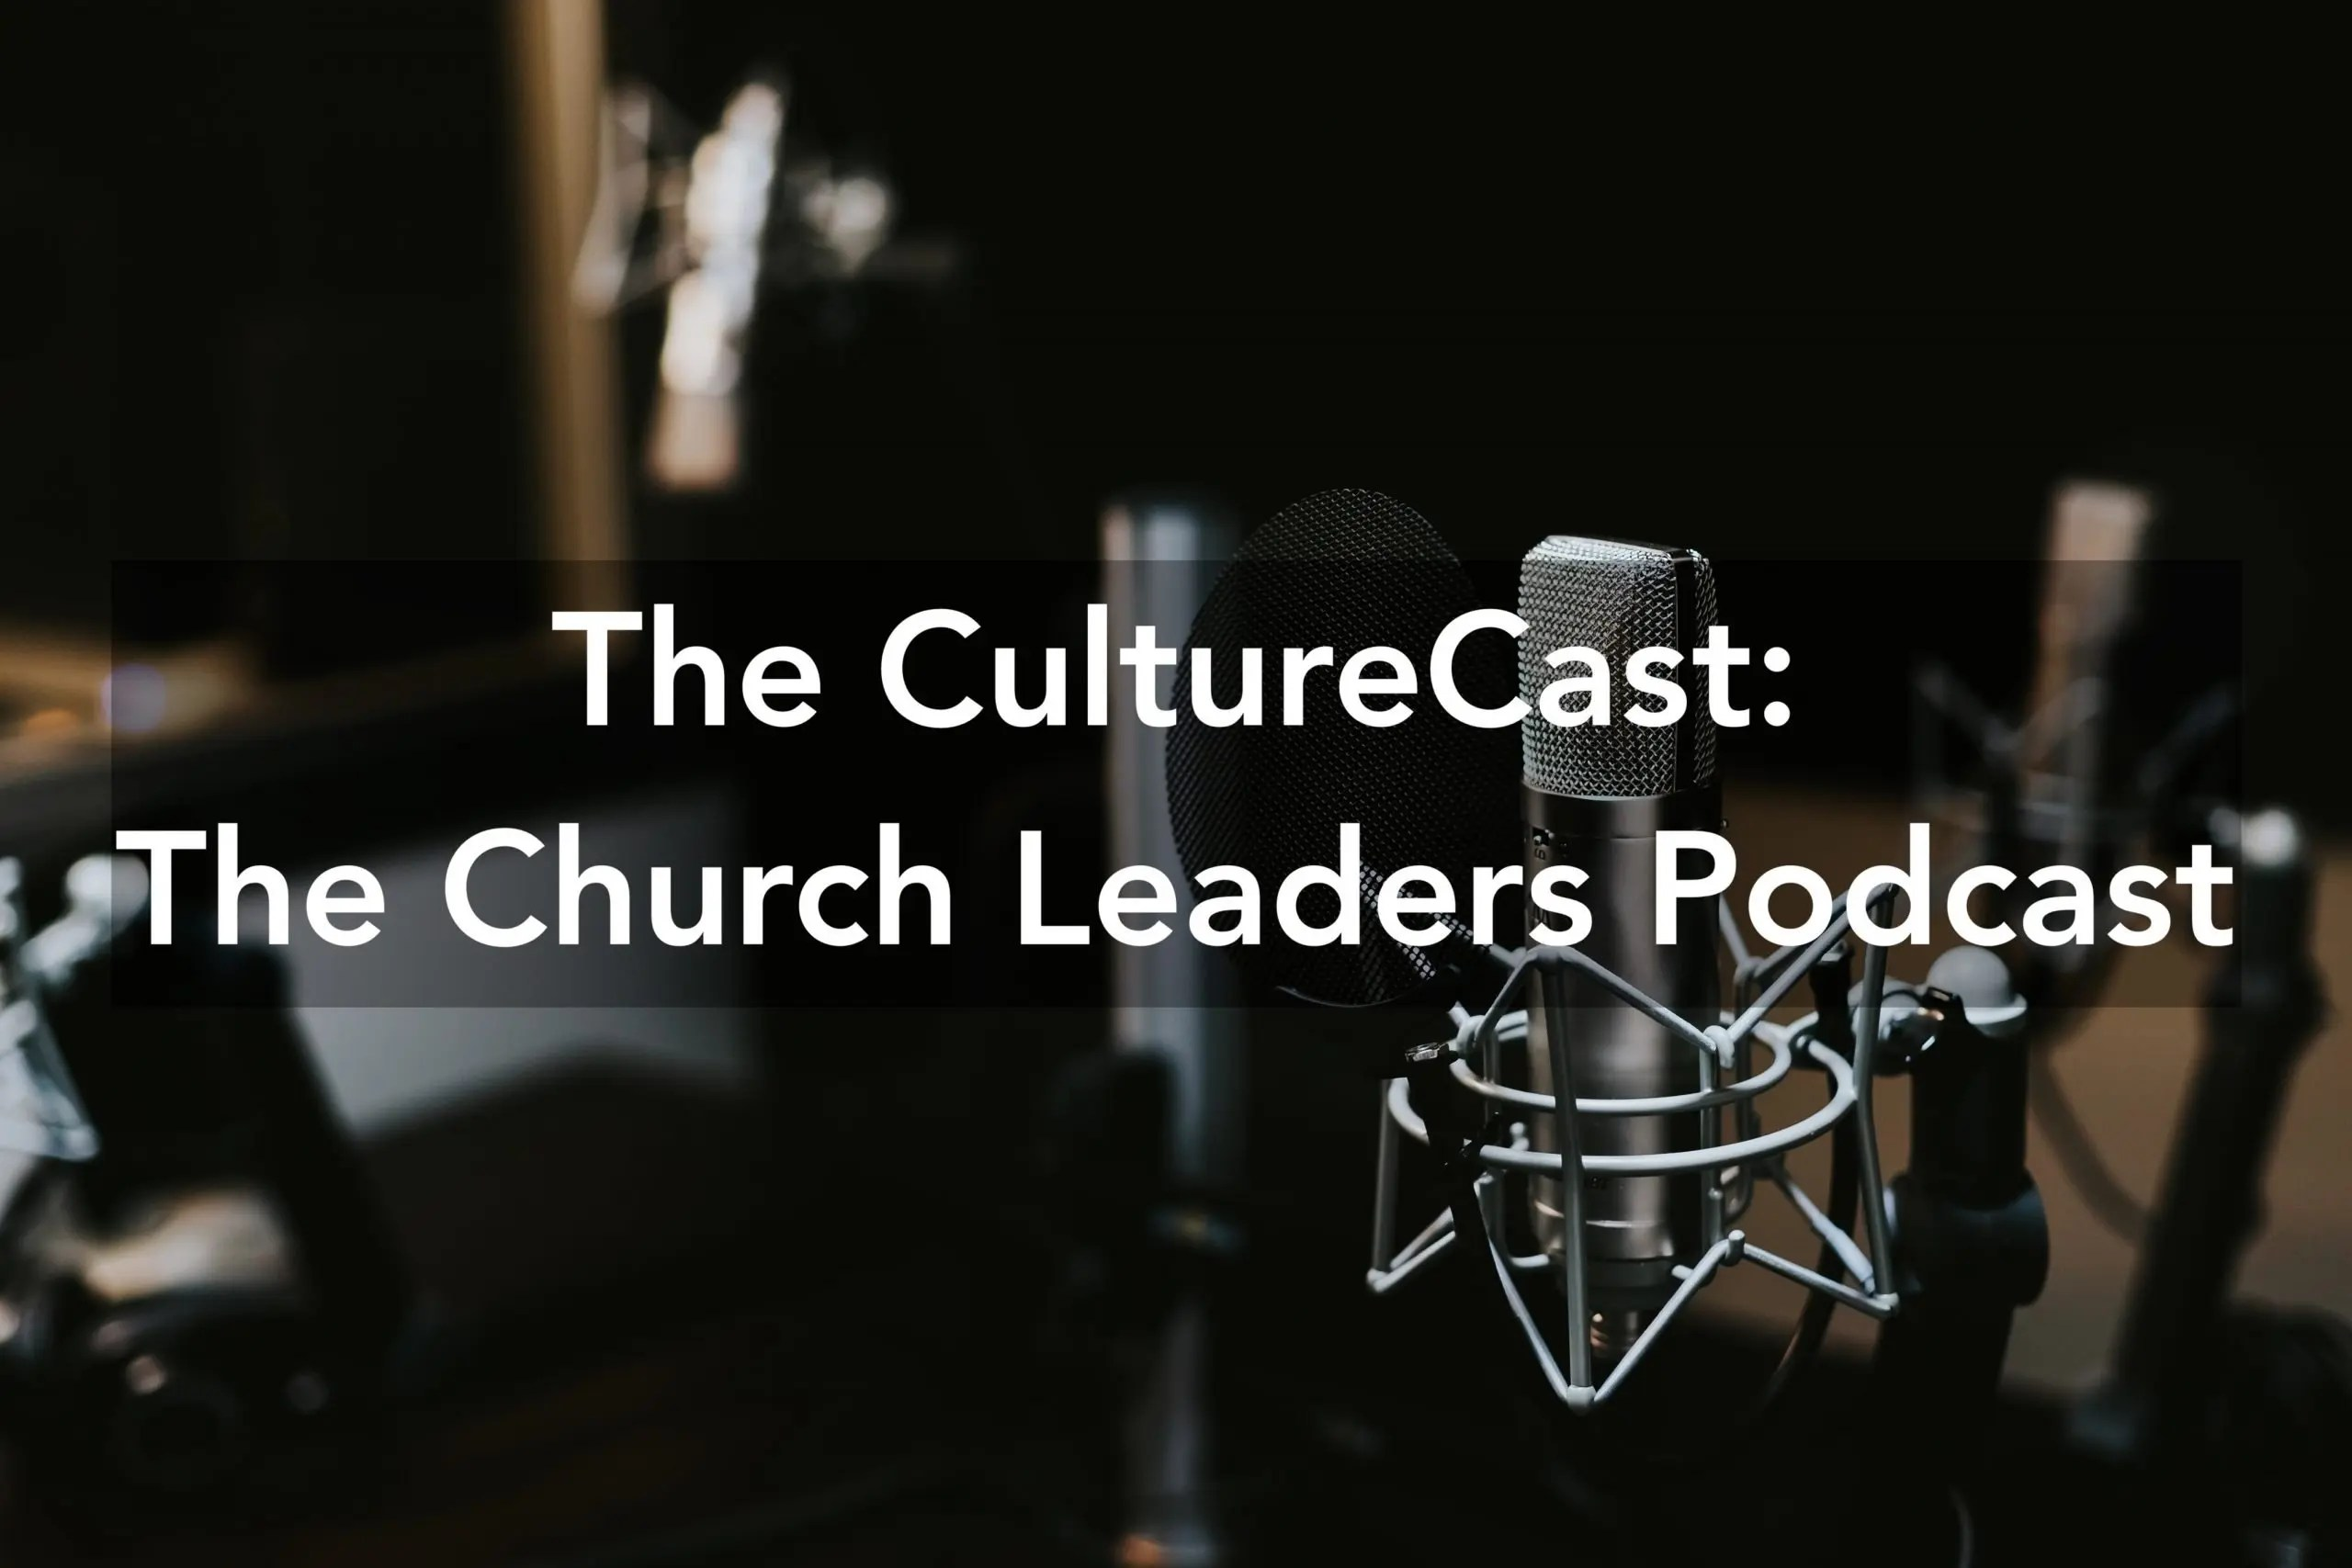 church leaders podcast